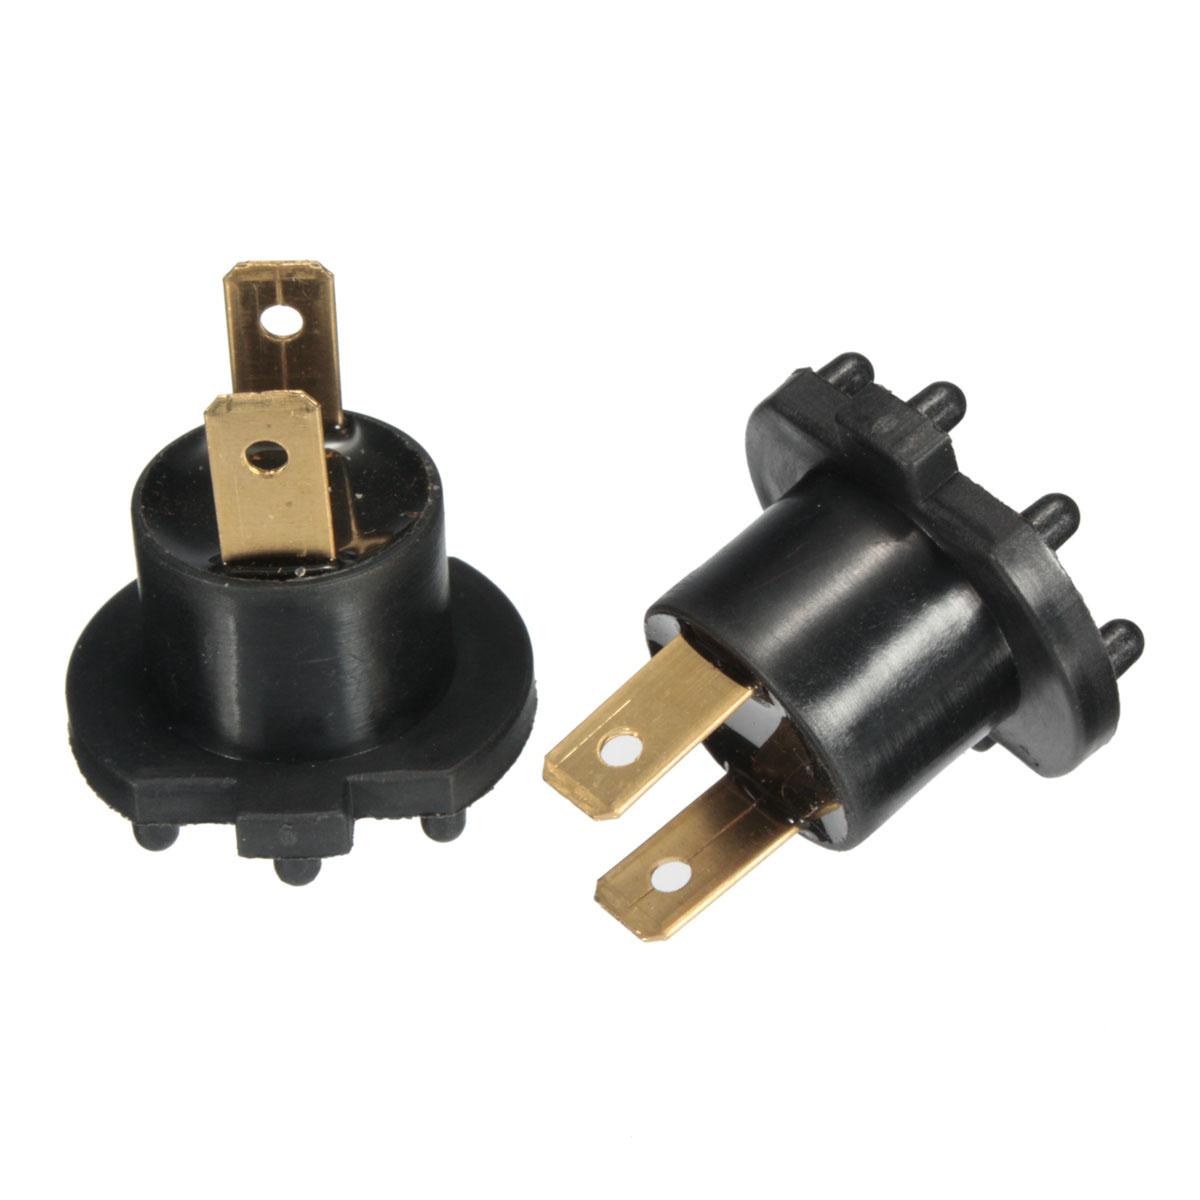 Mazda 6 Headlamp Socket : Pair headlight socket holder for dorman bulb mazda